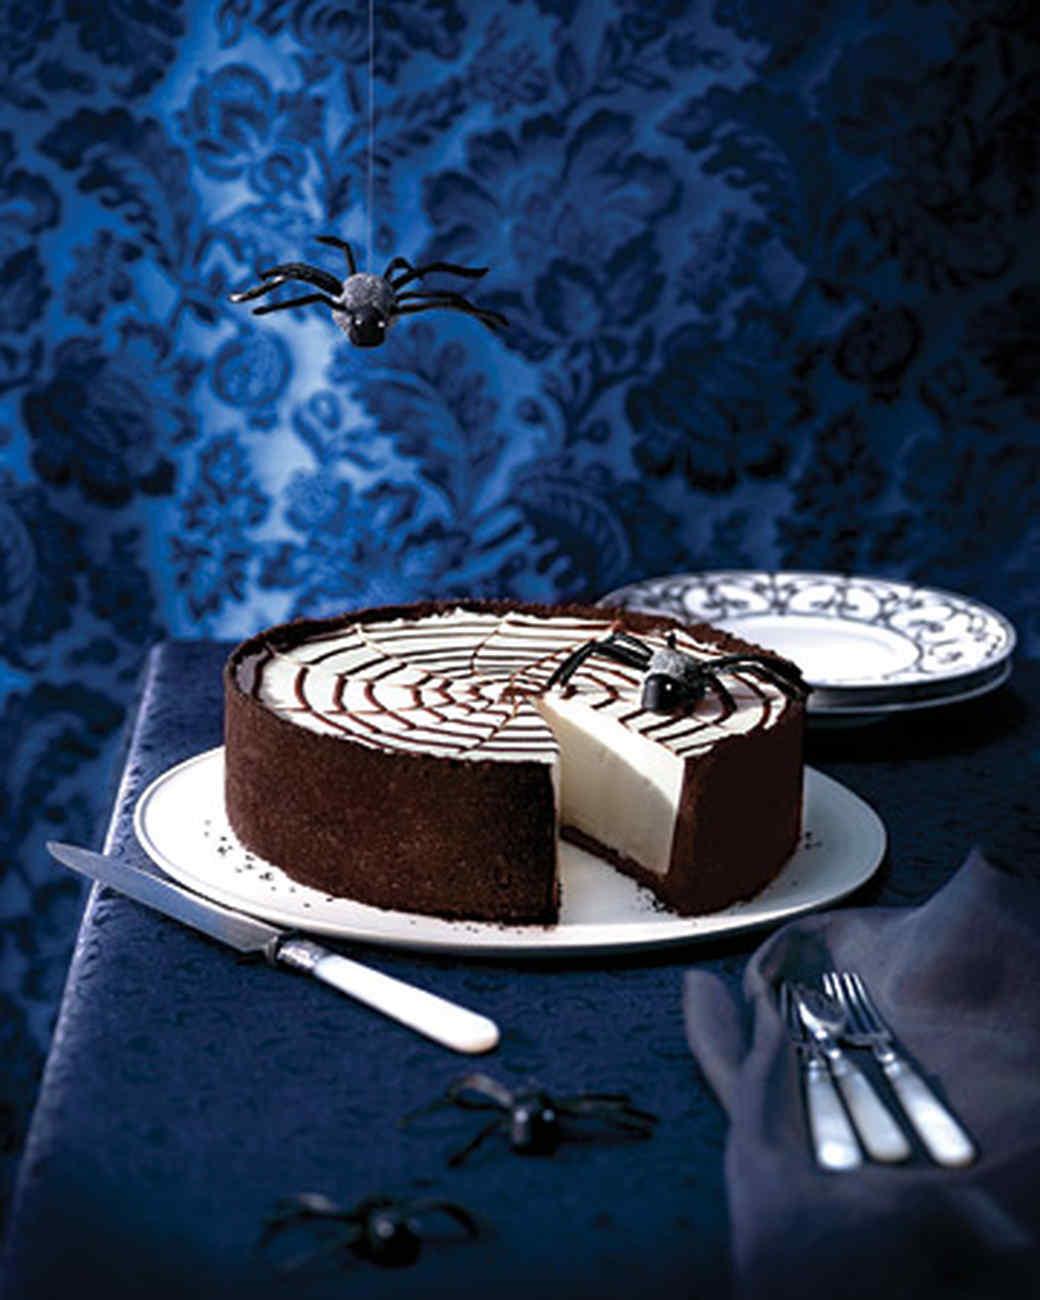 mld103866_1008_cheesecake.jpg